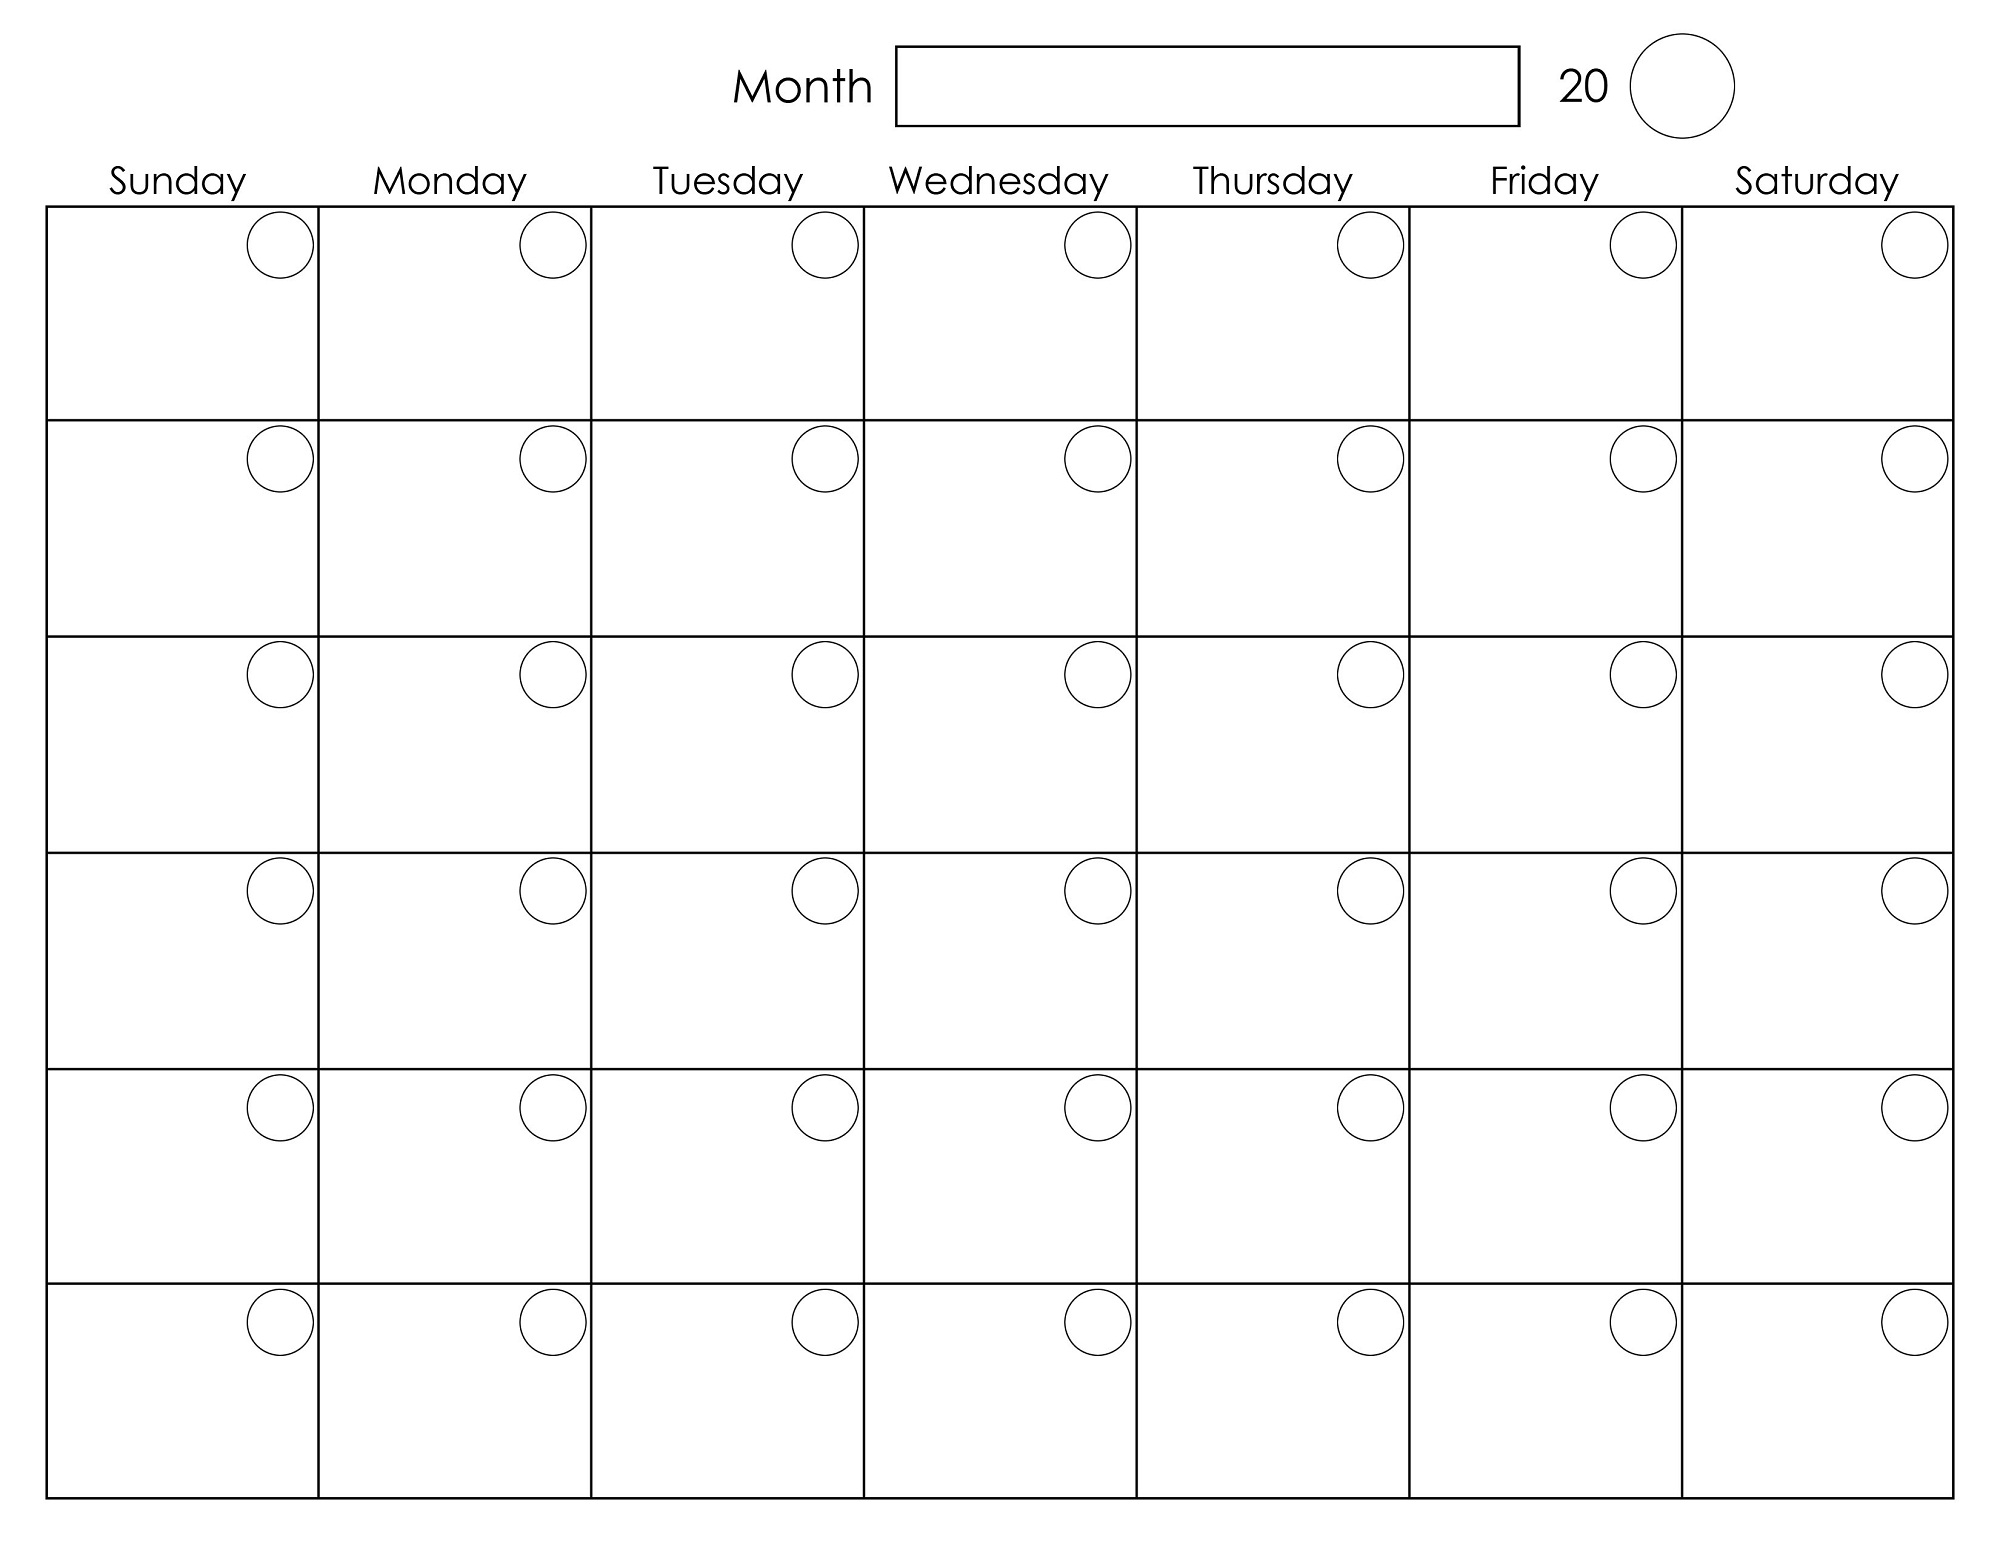 blank weekly calendar for print